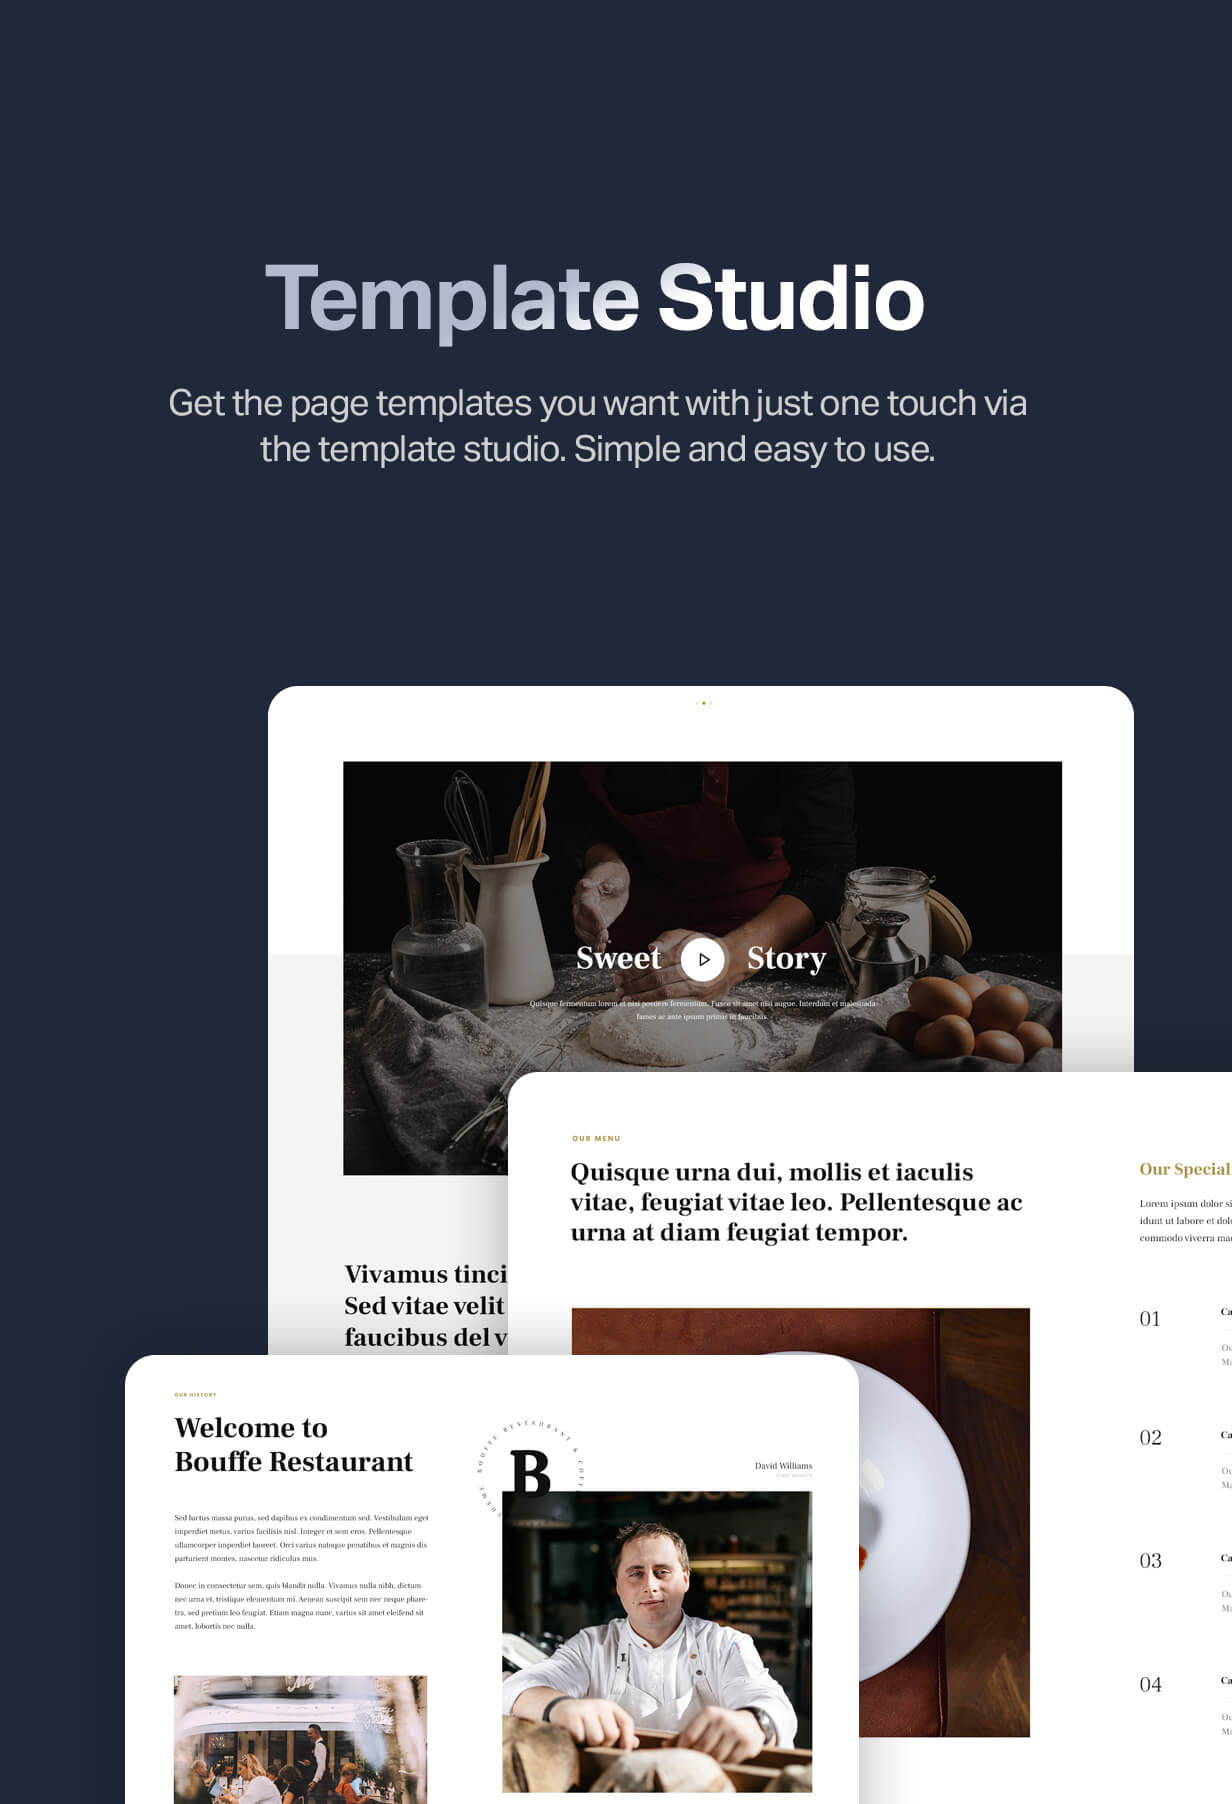 Template studio